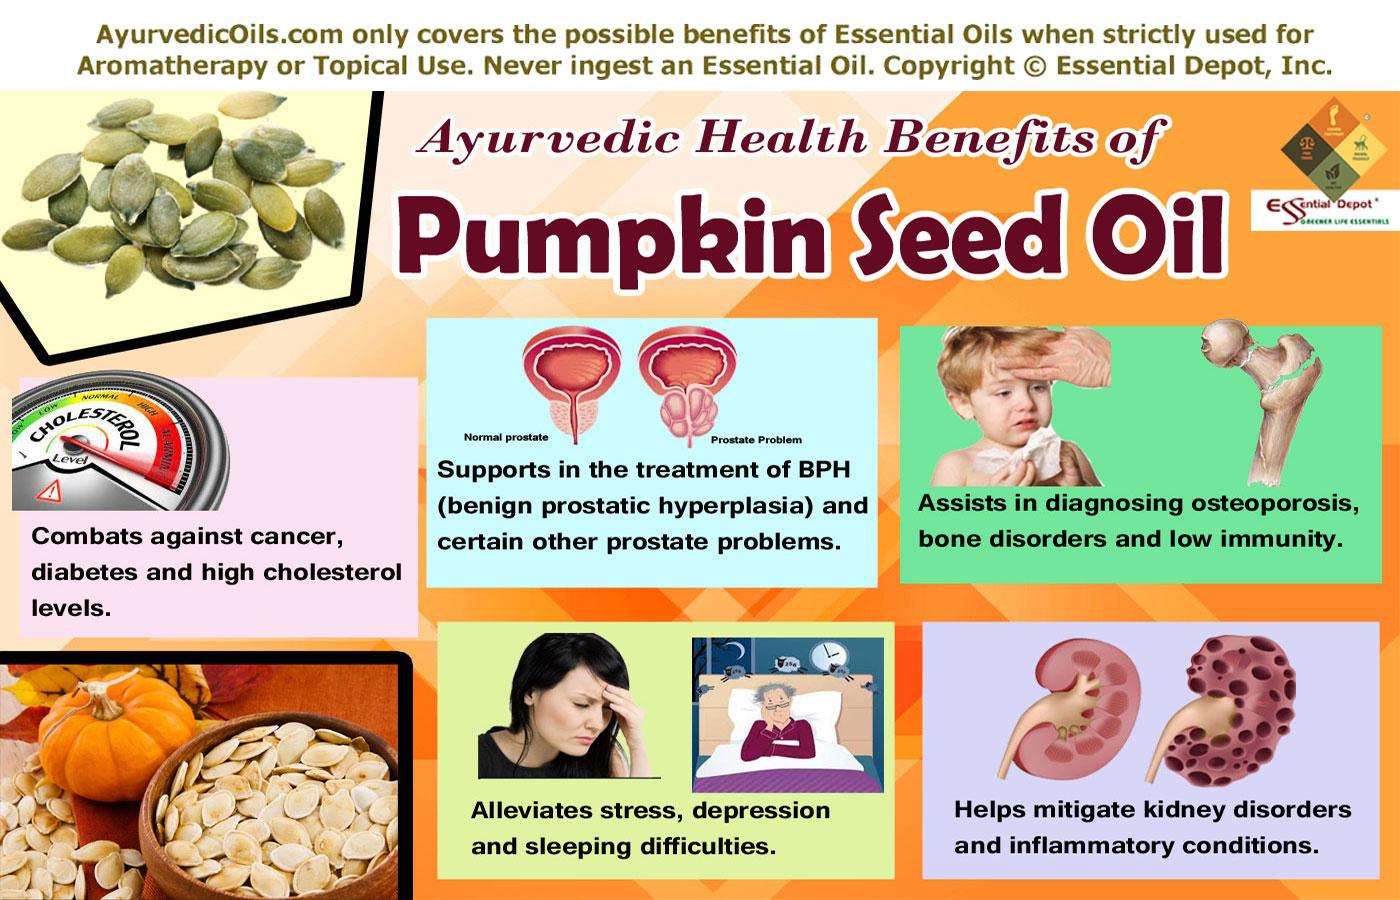 pumpkin seed oil prostate treatment)